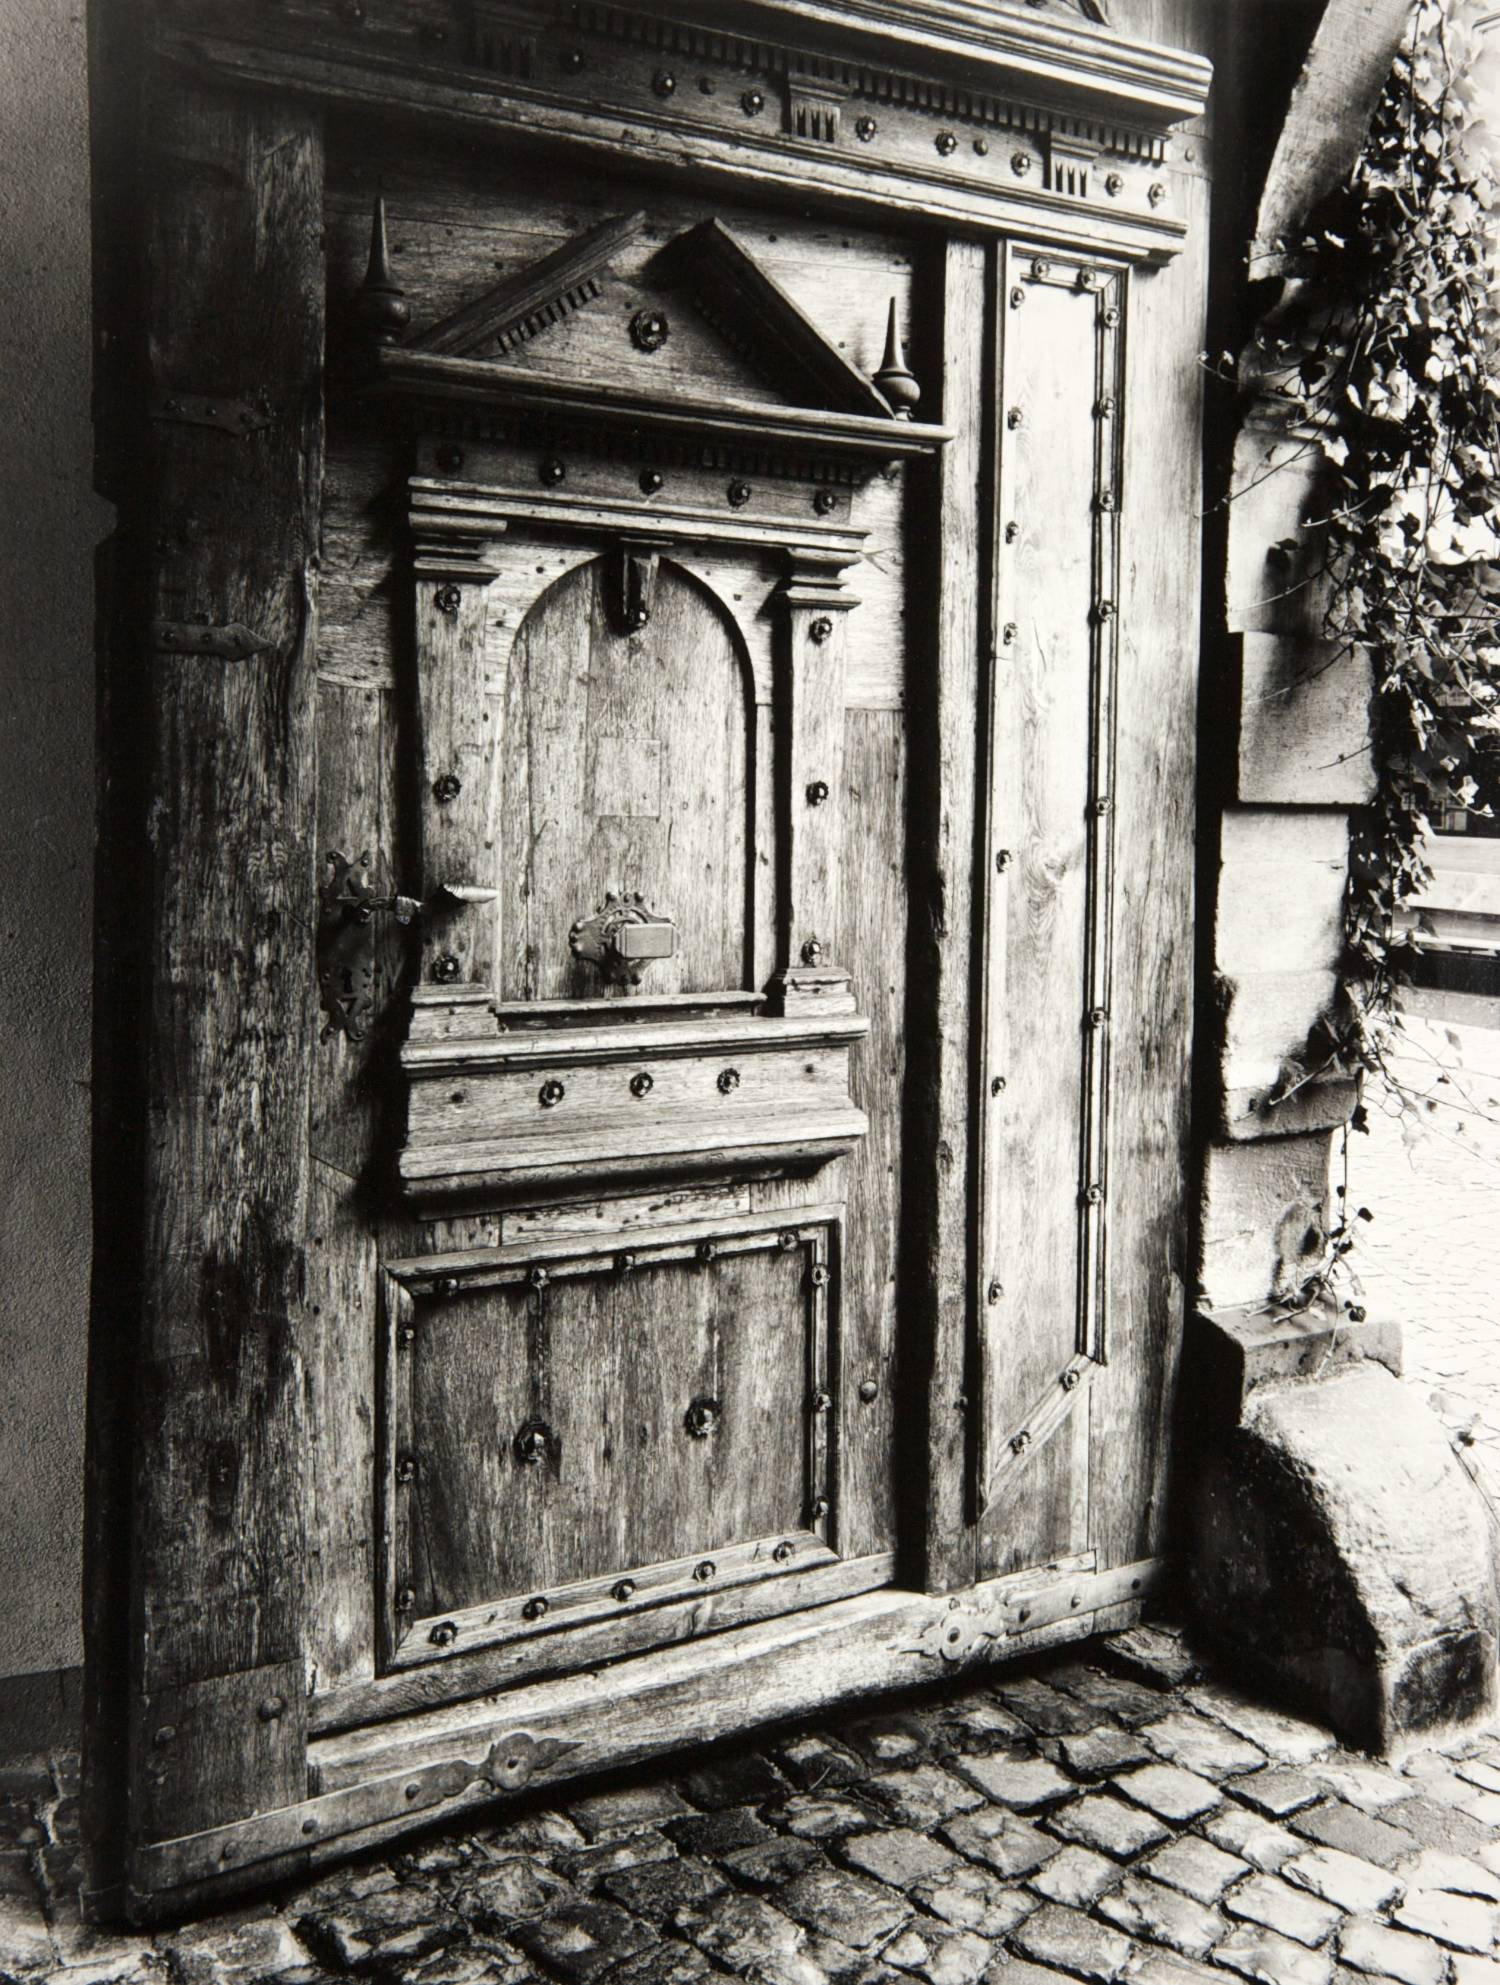 Door in Bacharach (Germany)